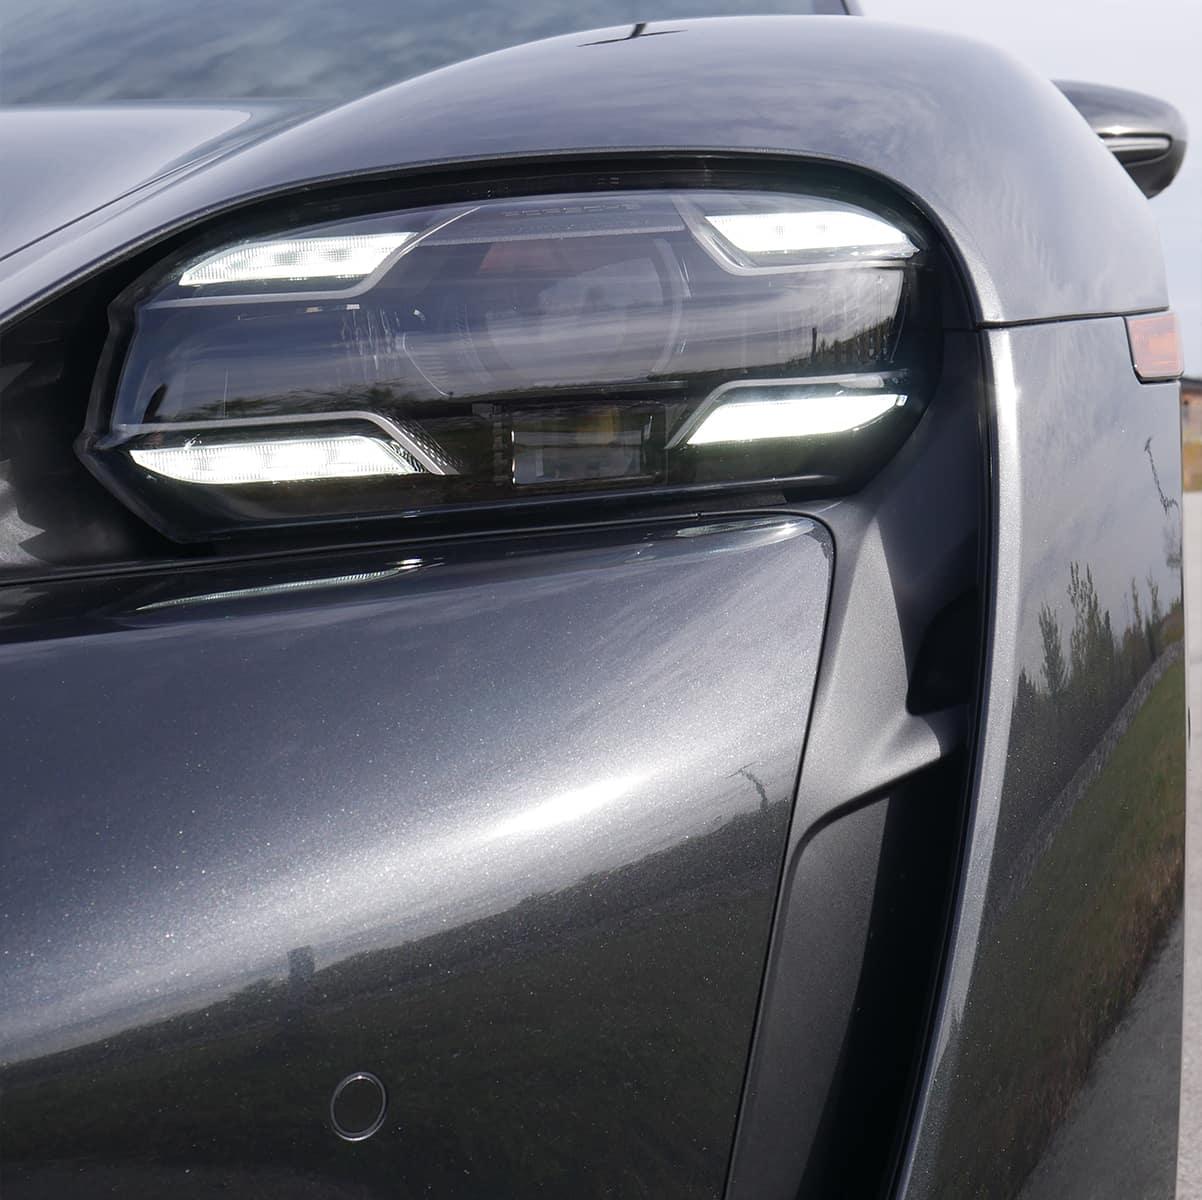 Porsche Taycan Headlight